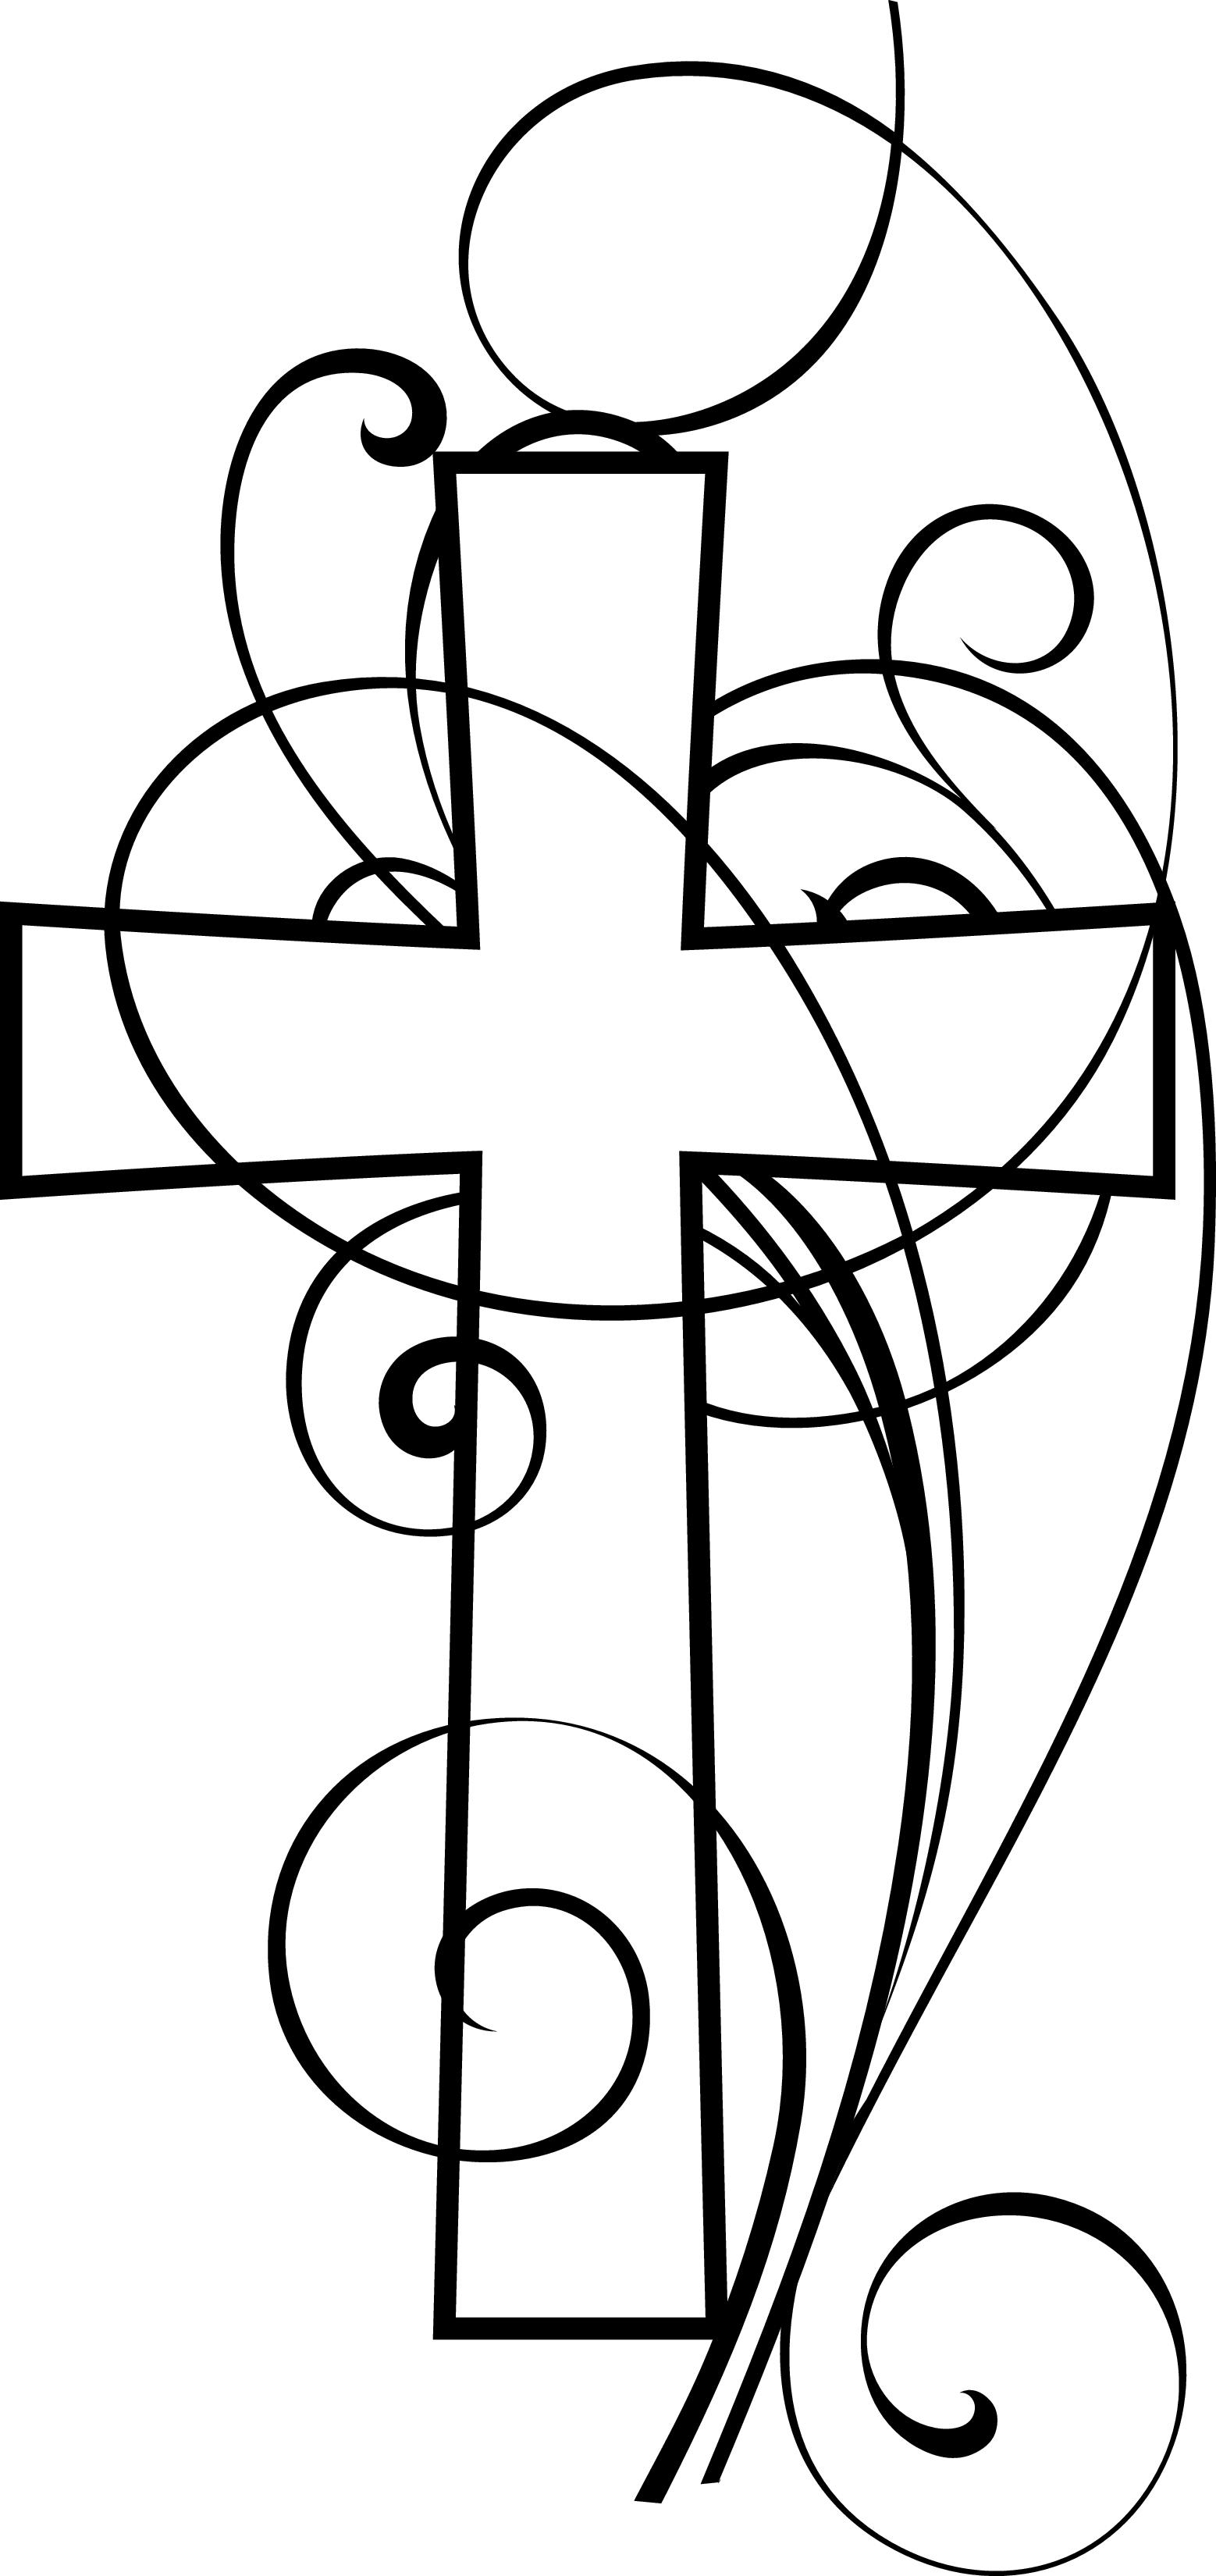 Catholic clip art borders 3